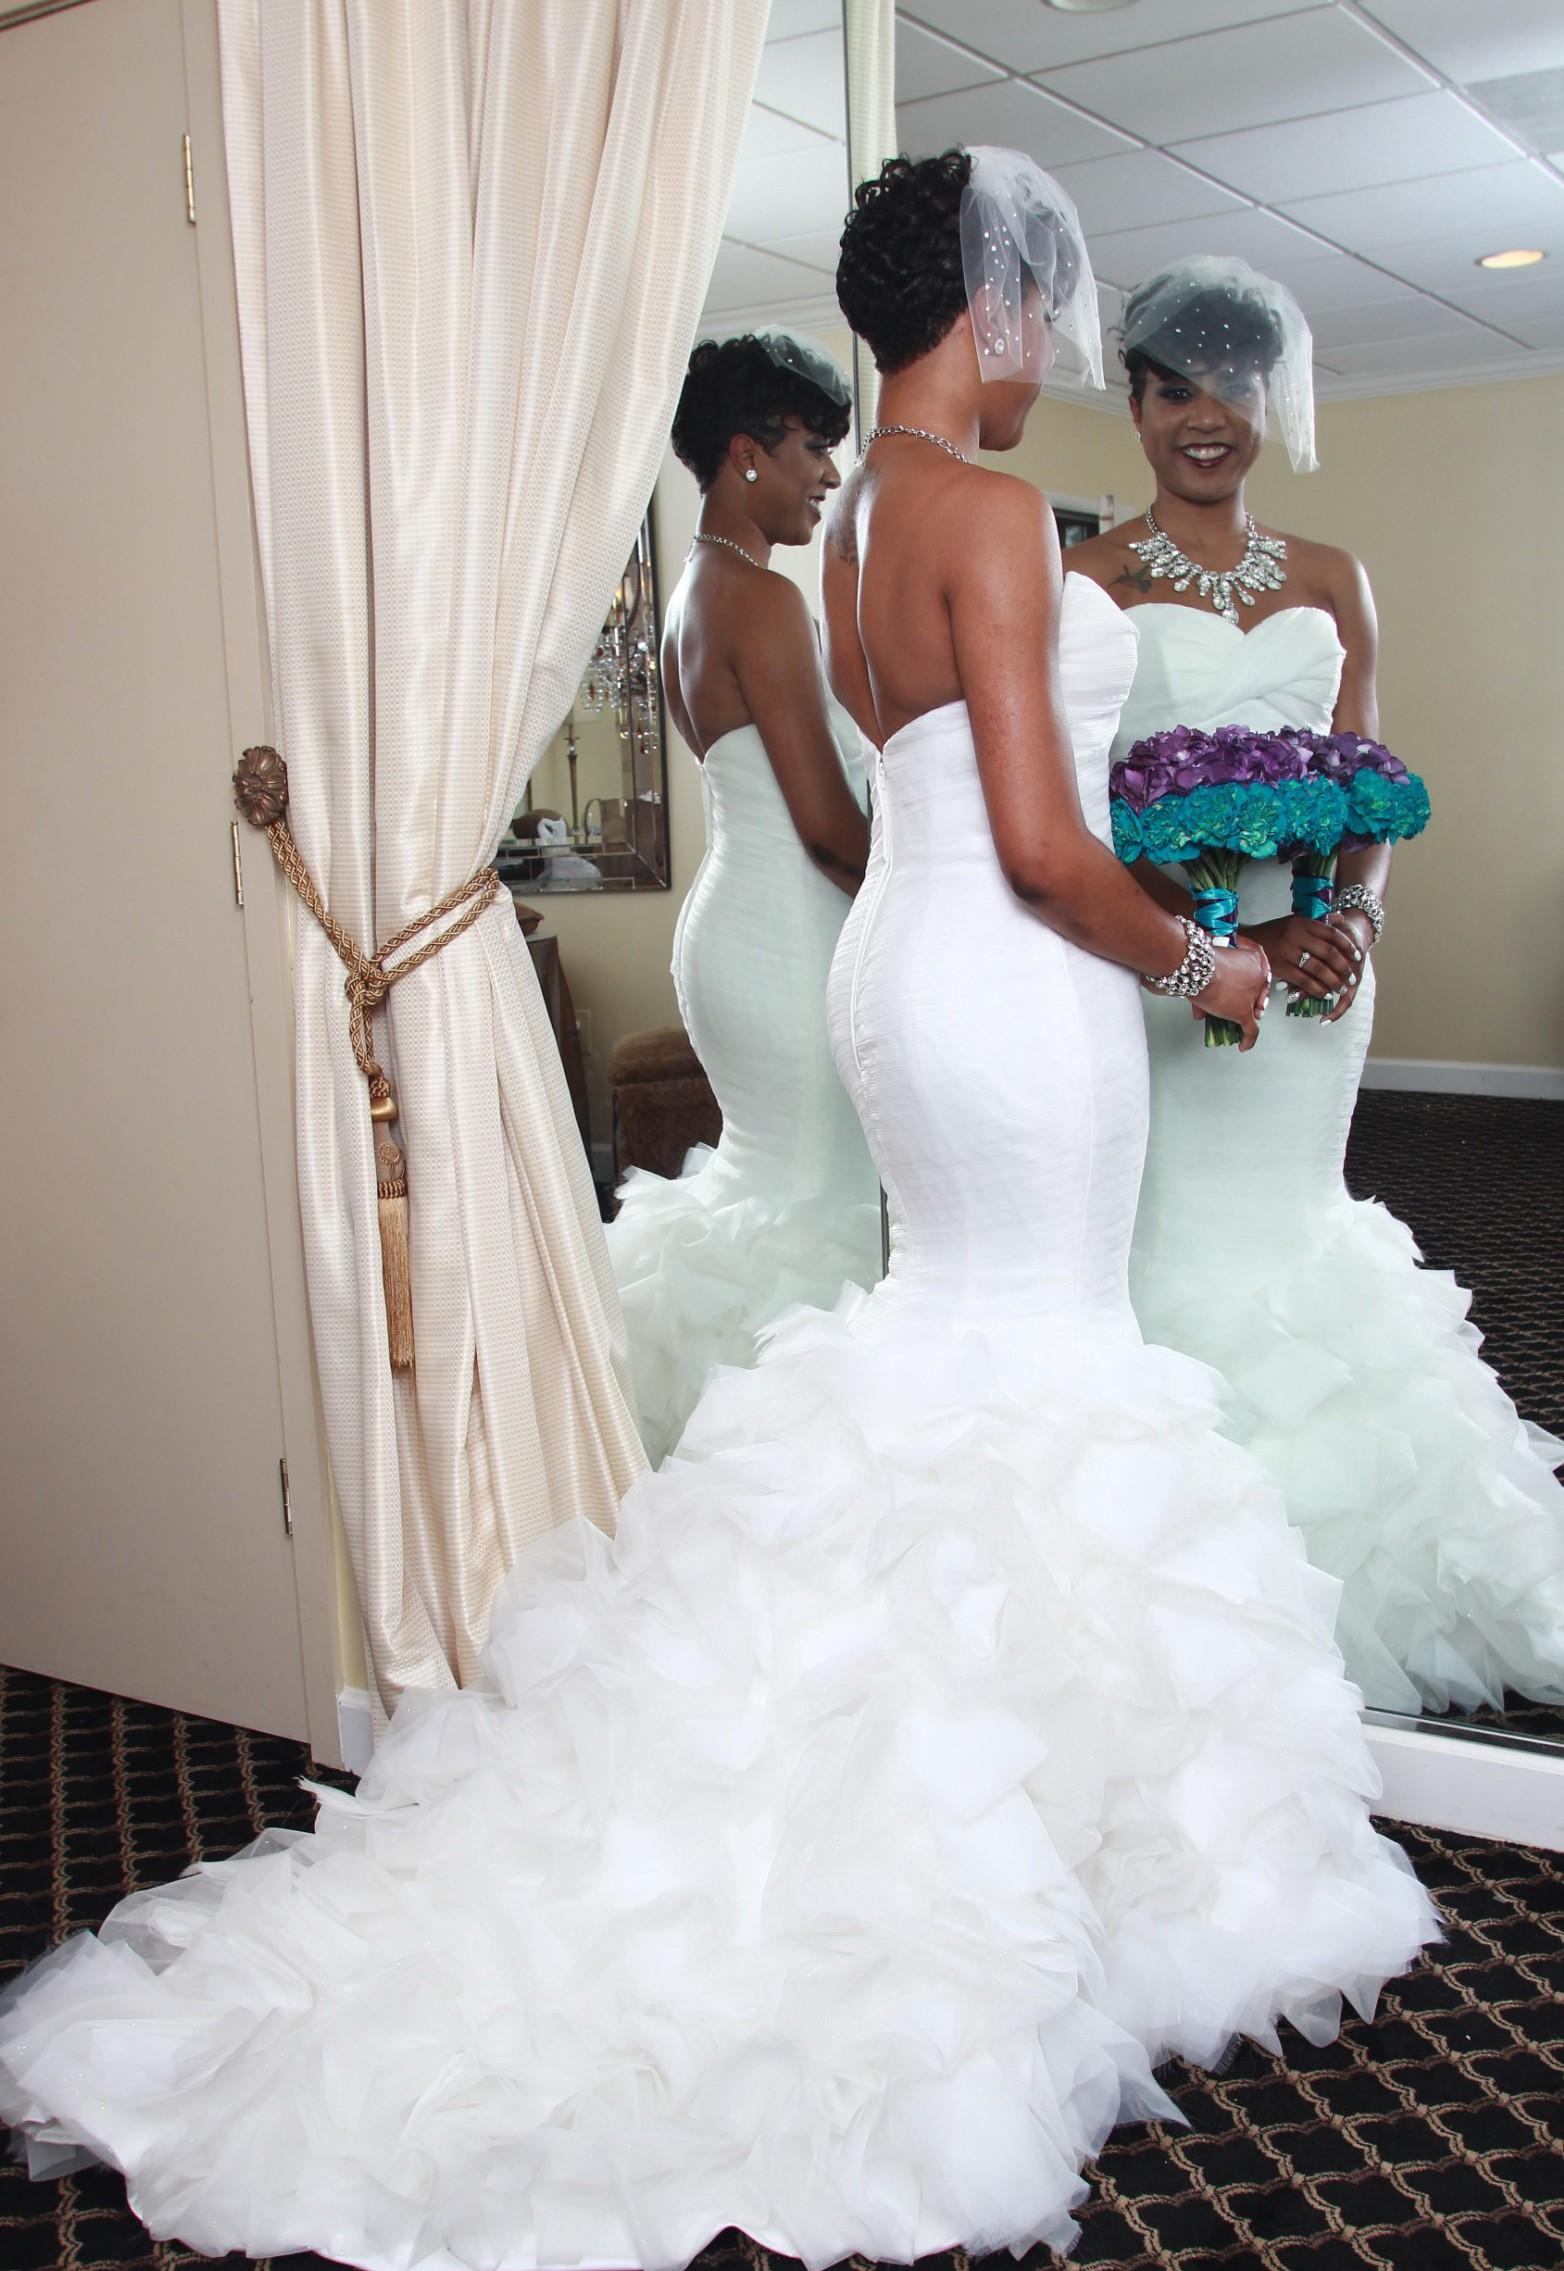 Used wedding dresses atlanta ga : Winnie couture esme wedding dress on sale